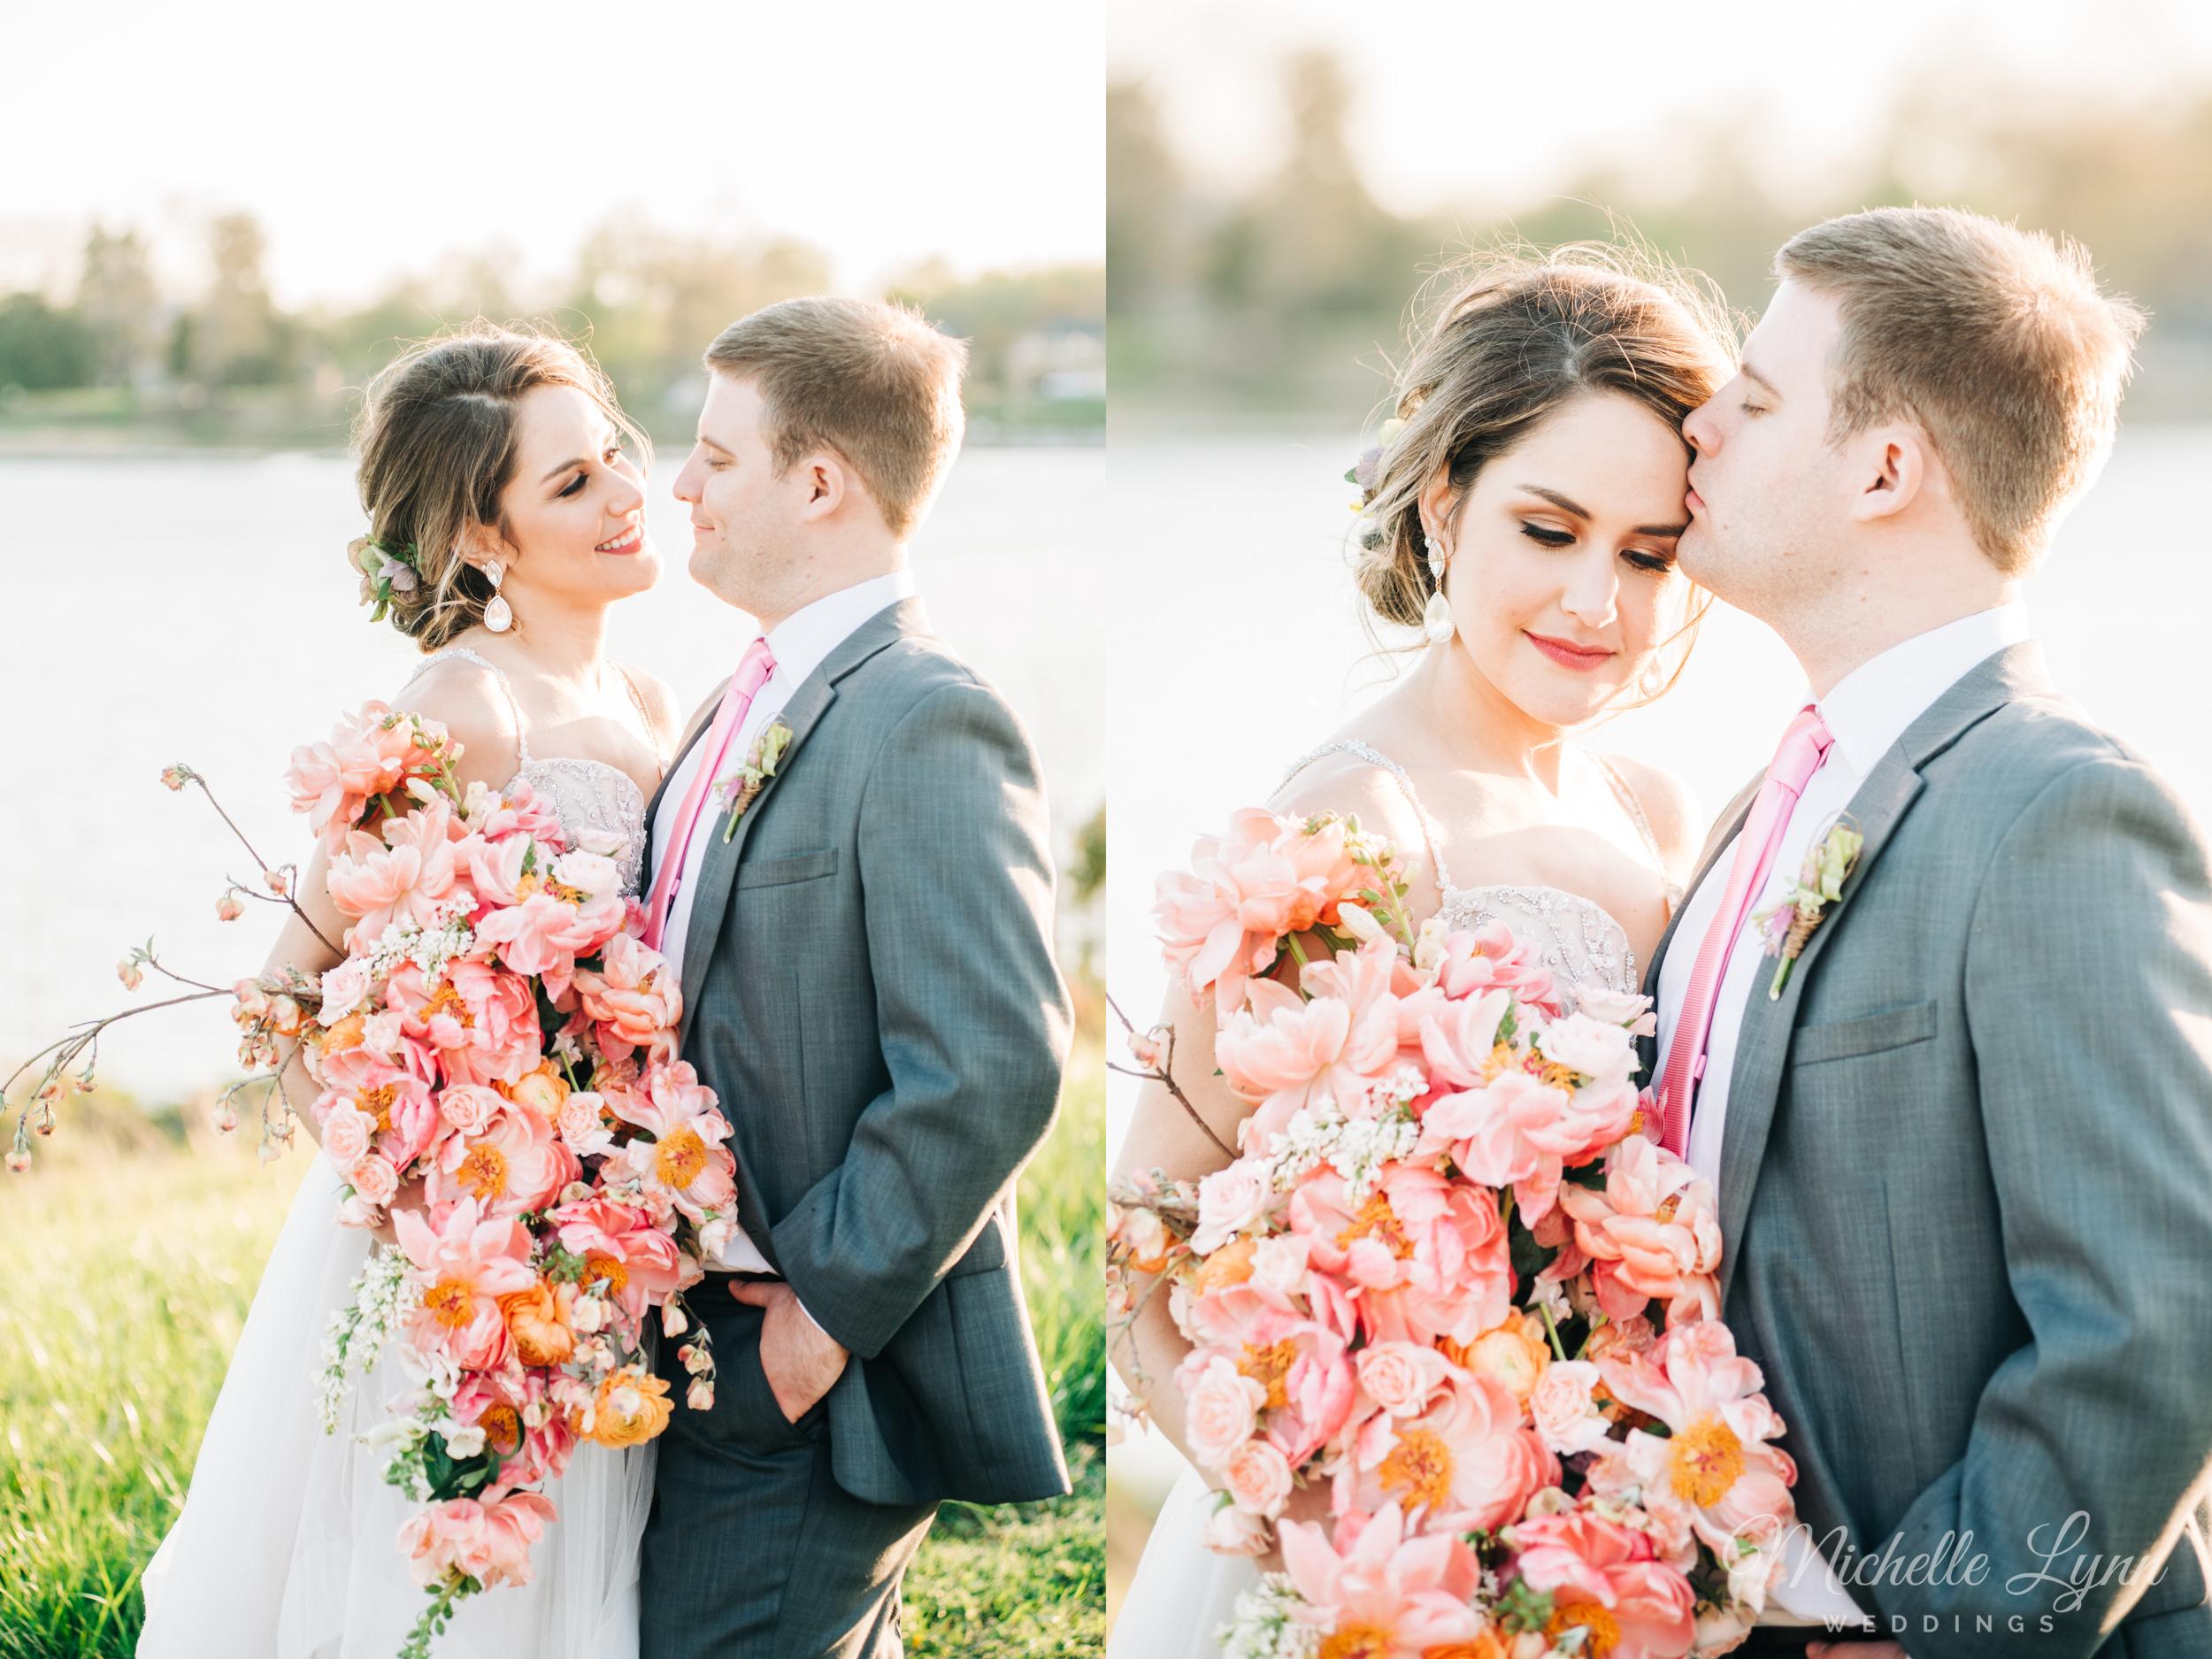 mlw-whitehall-annapolis-maryland-wedding-37.jpg